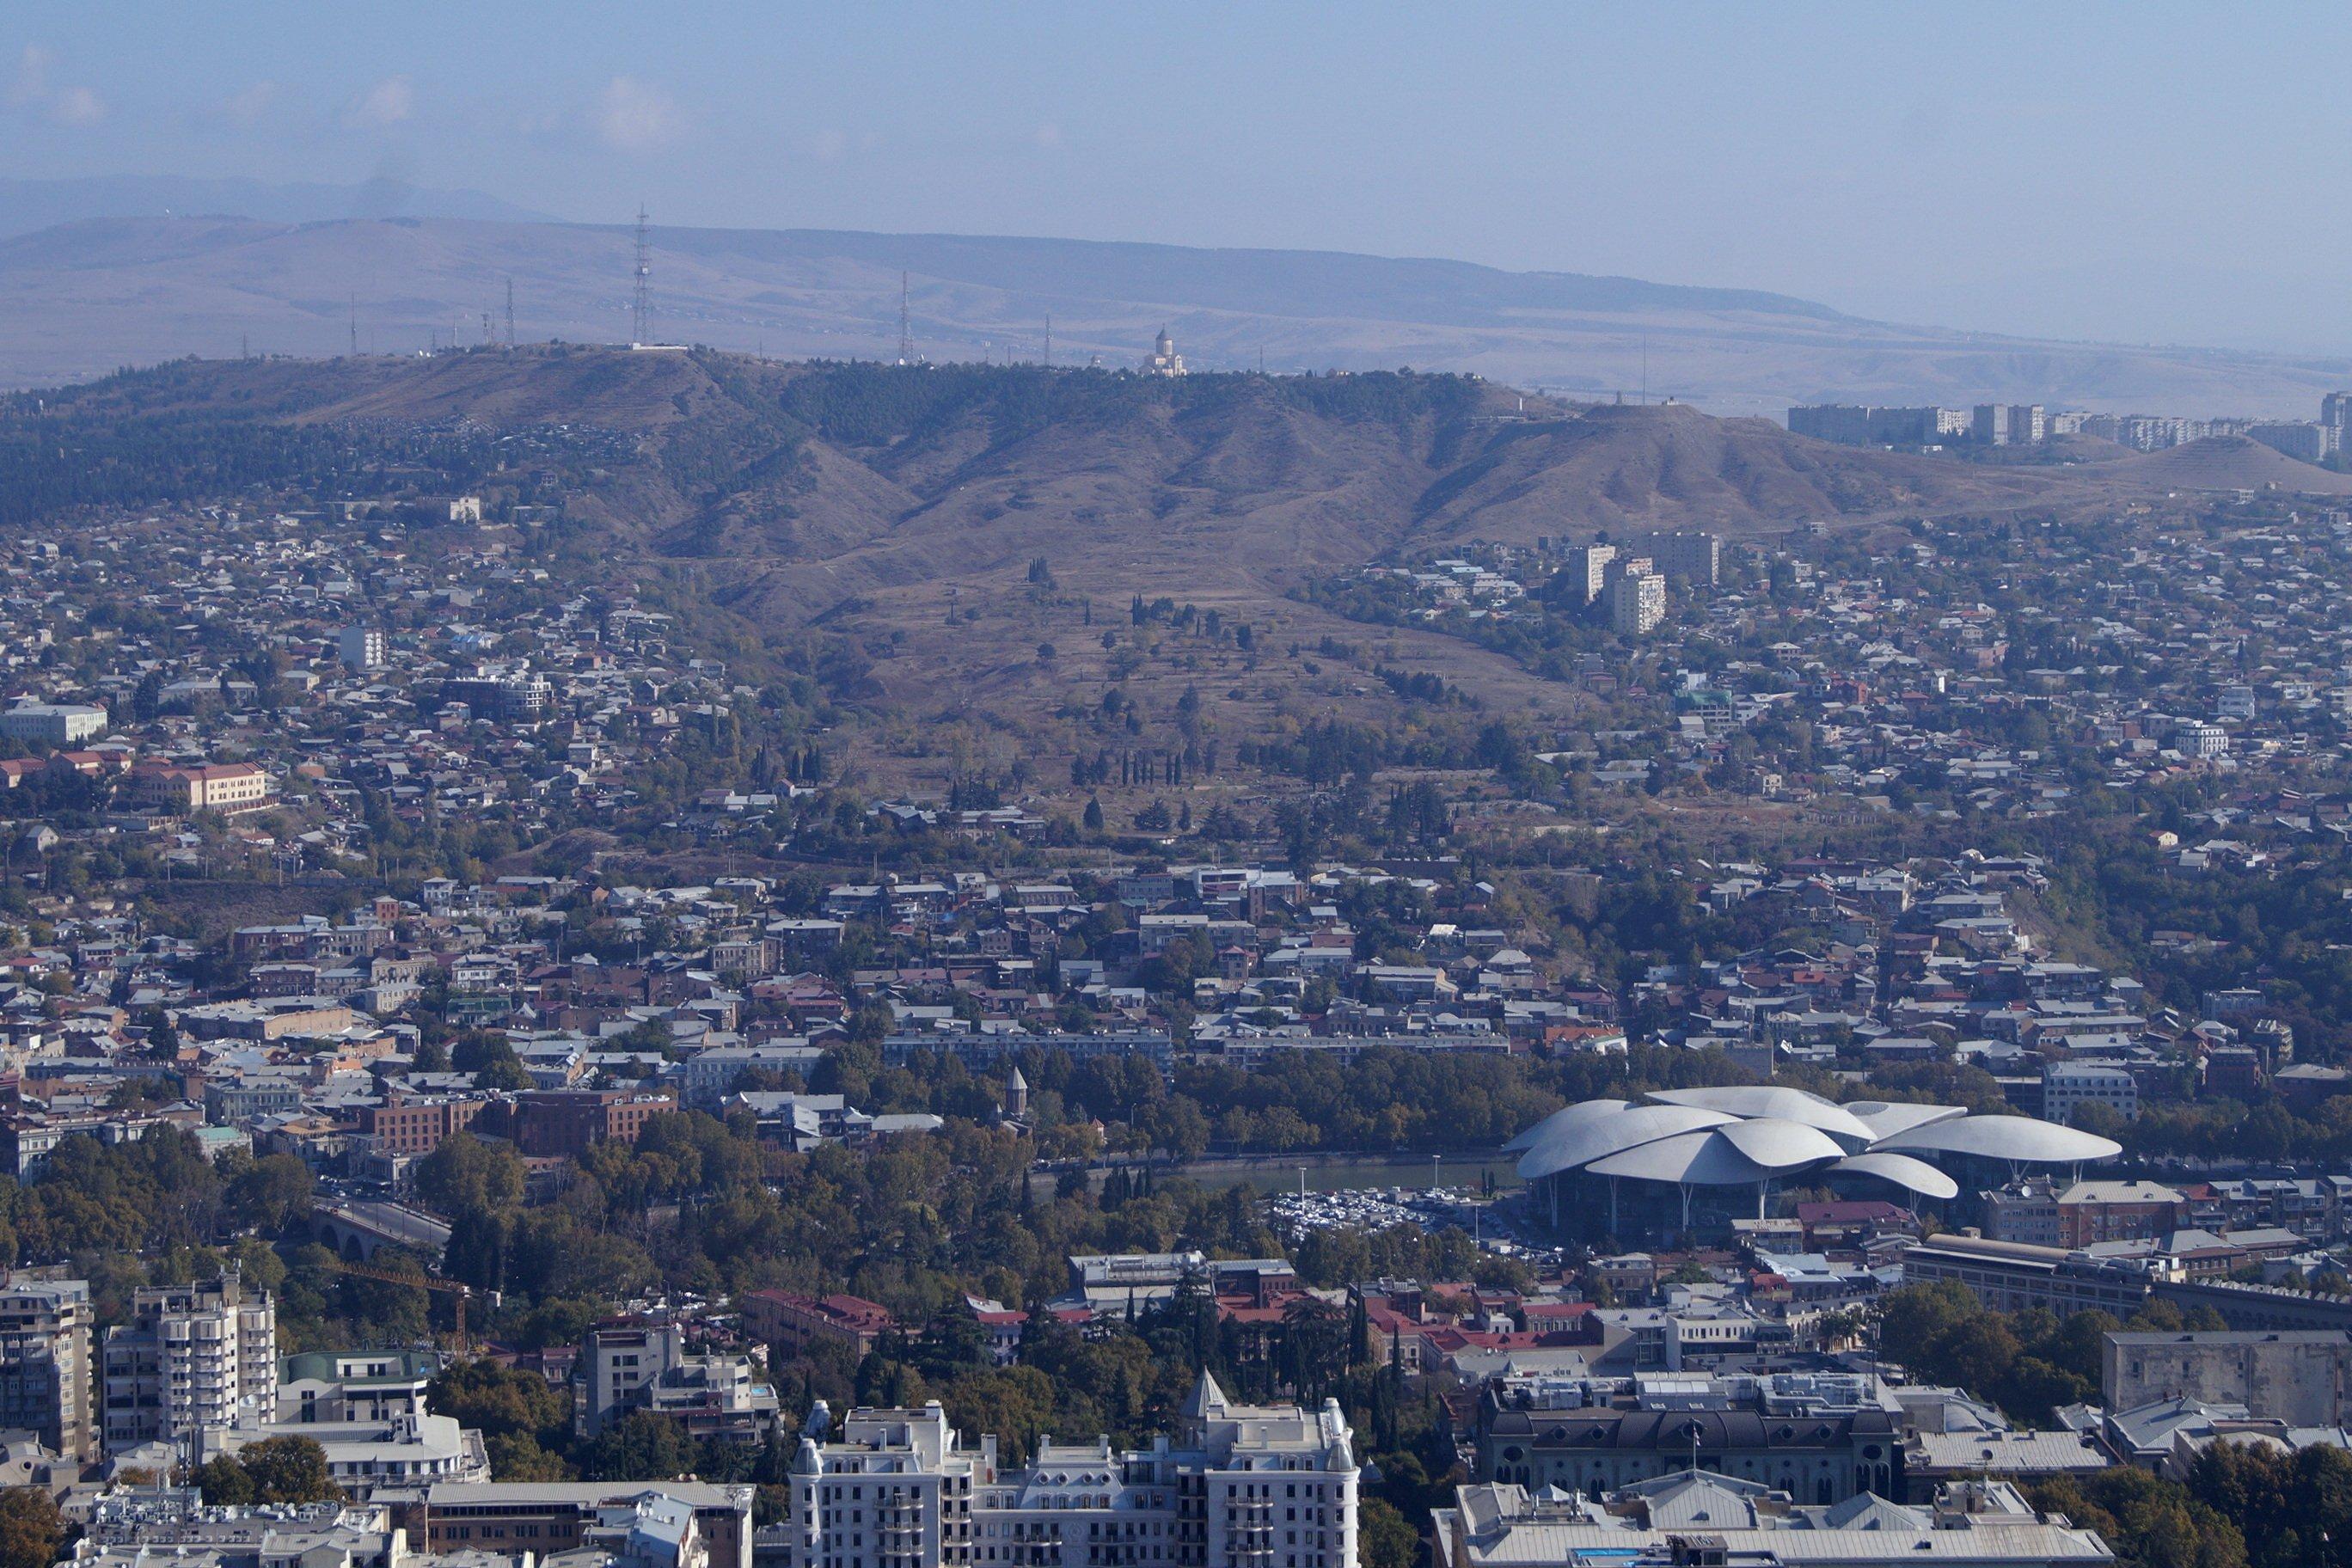 Картинки из Тбилиси (от Нарикалы до Мтацминды). (Заметки из солнечного отпуска. День 10)